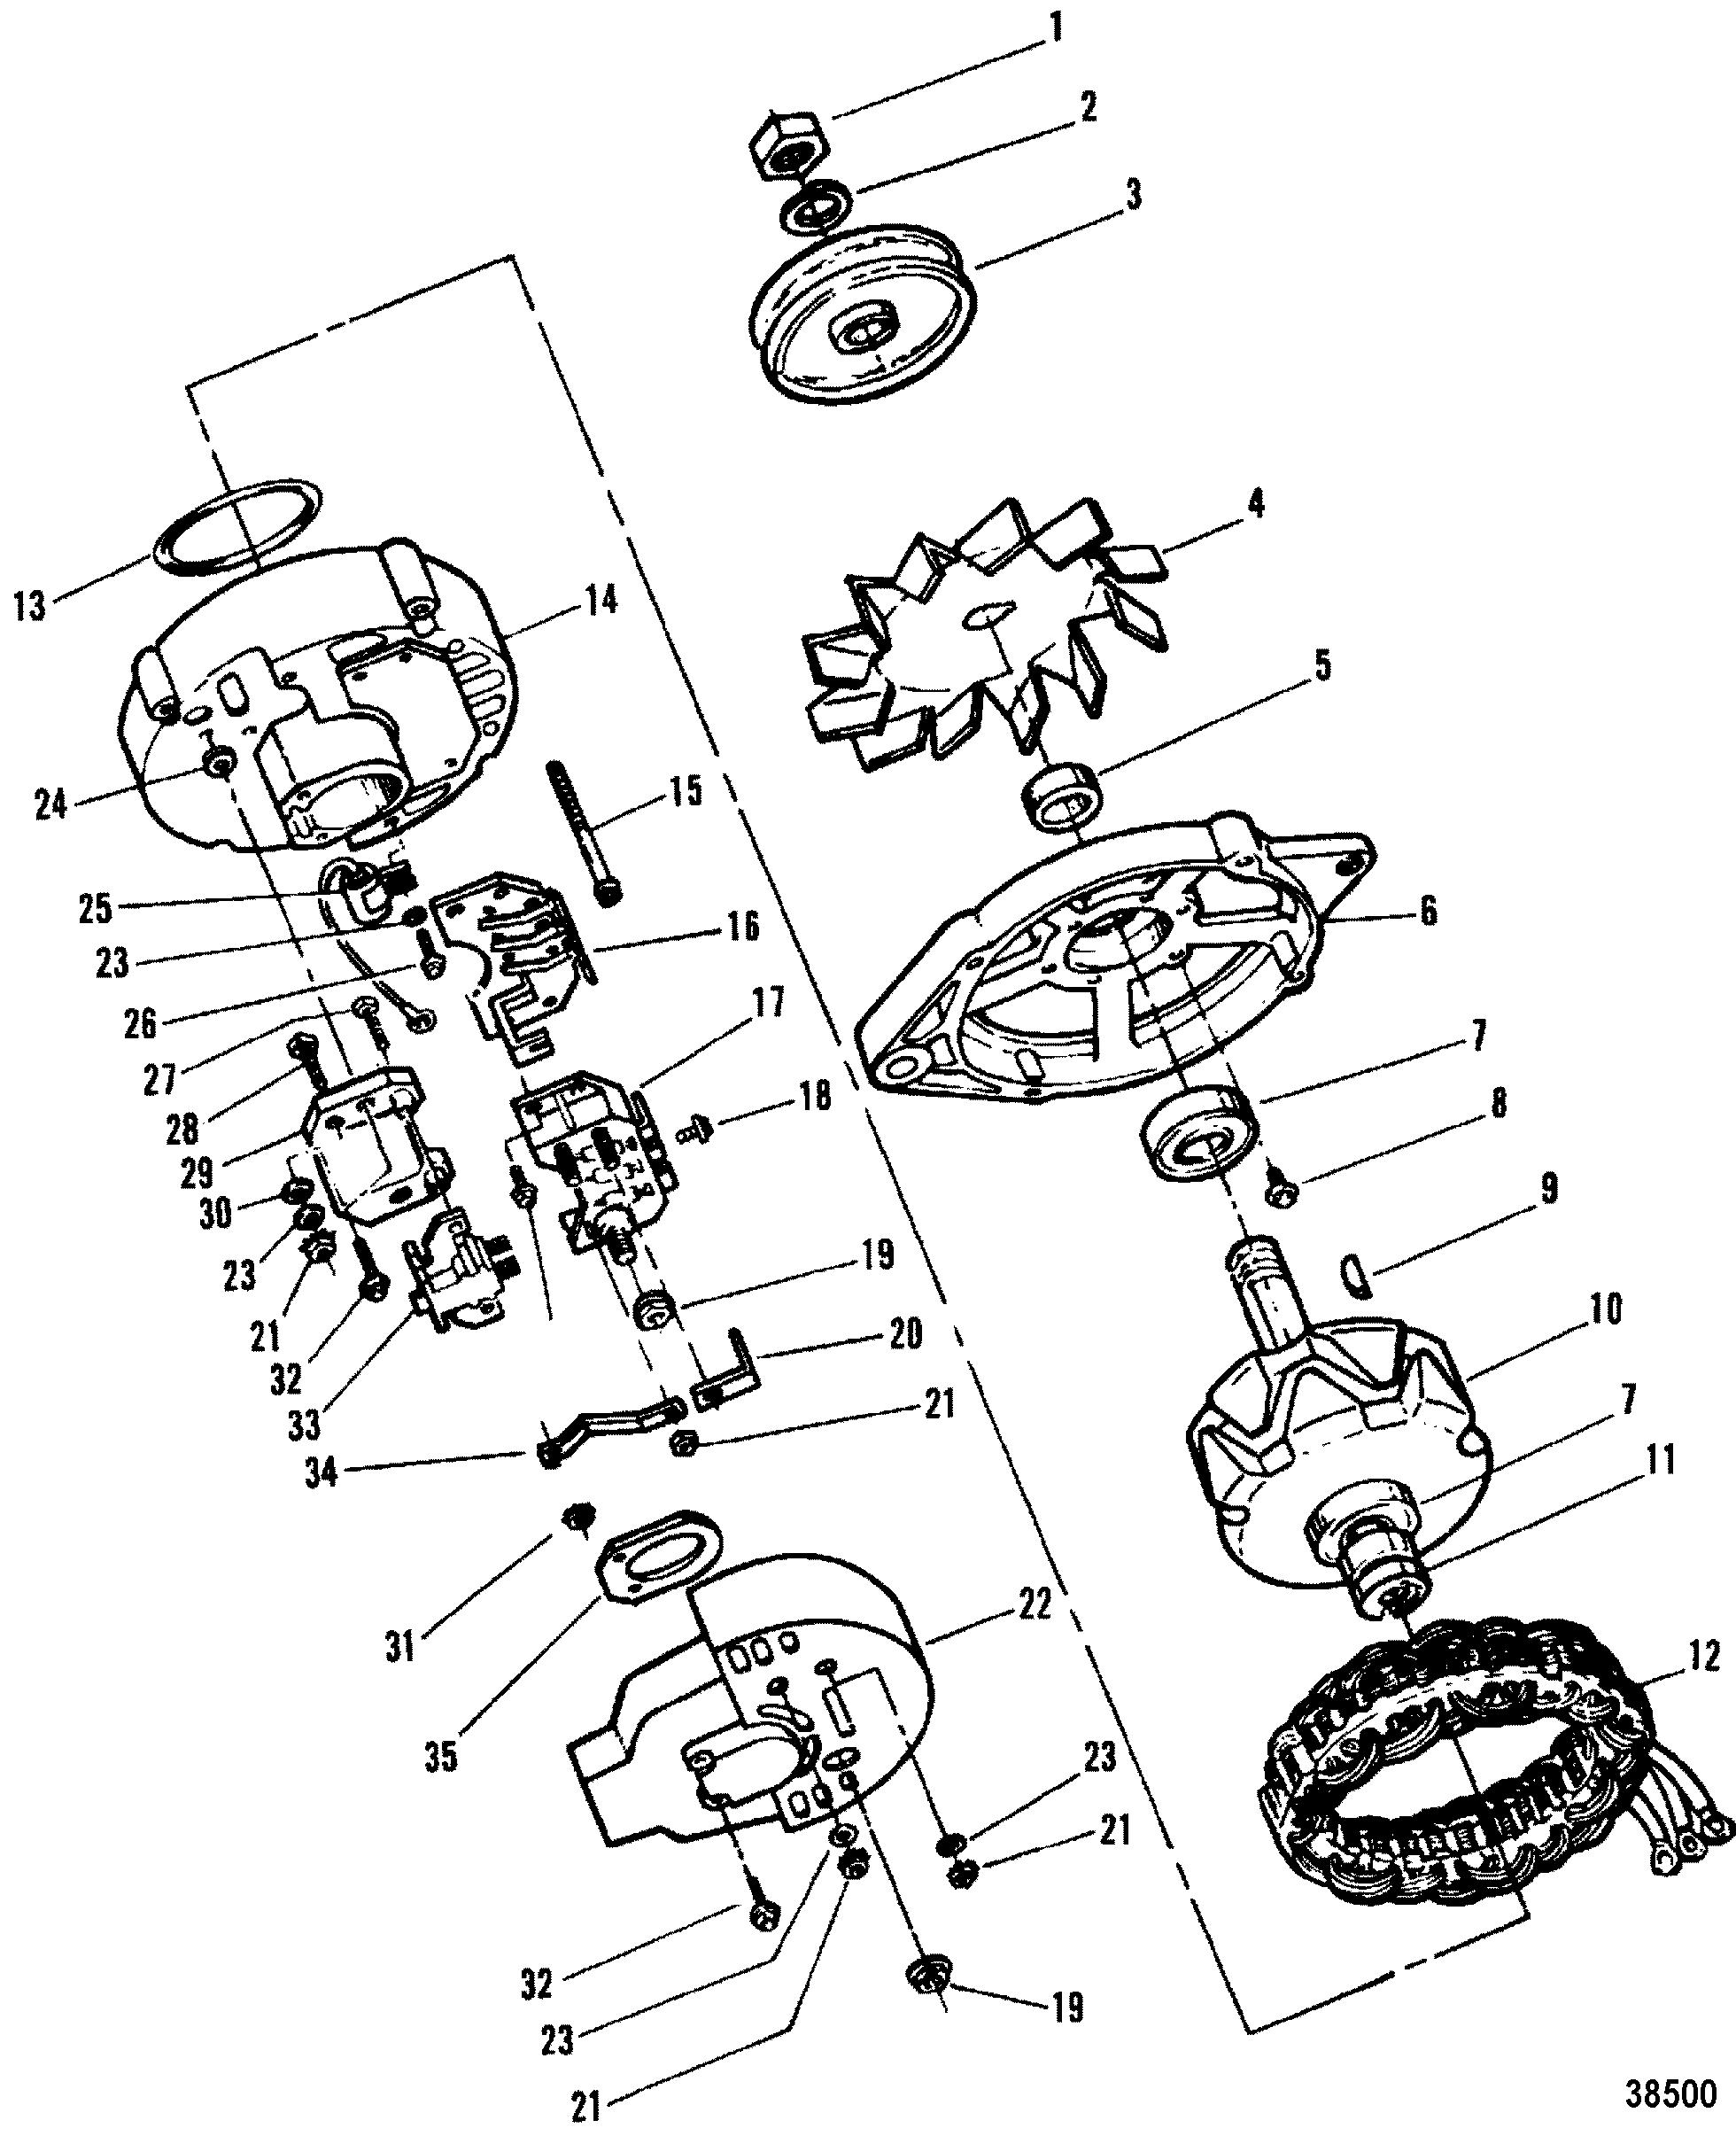 mercruiser 205 4 bbl gm 262 v 6 1987 3 Wire Alternator Wiring alternator motorola 8em2003ka